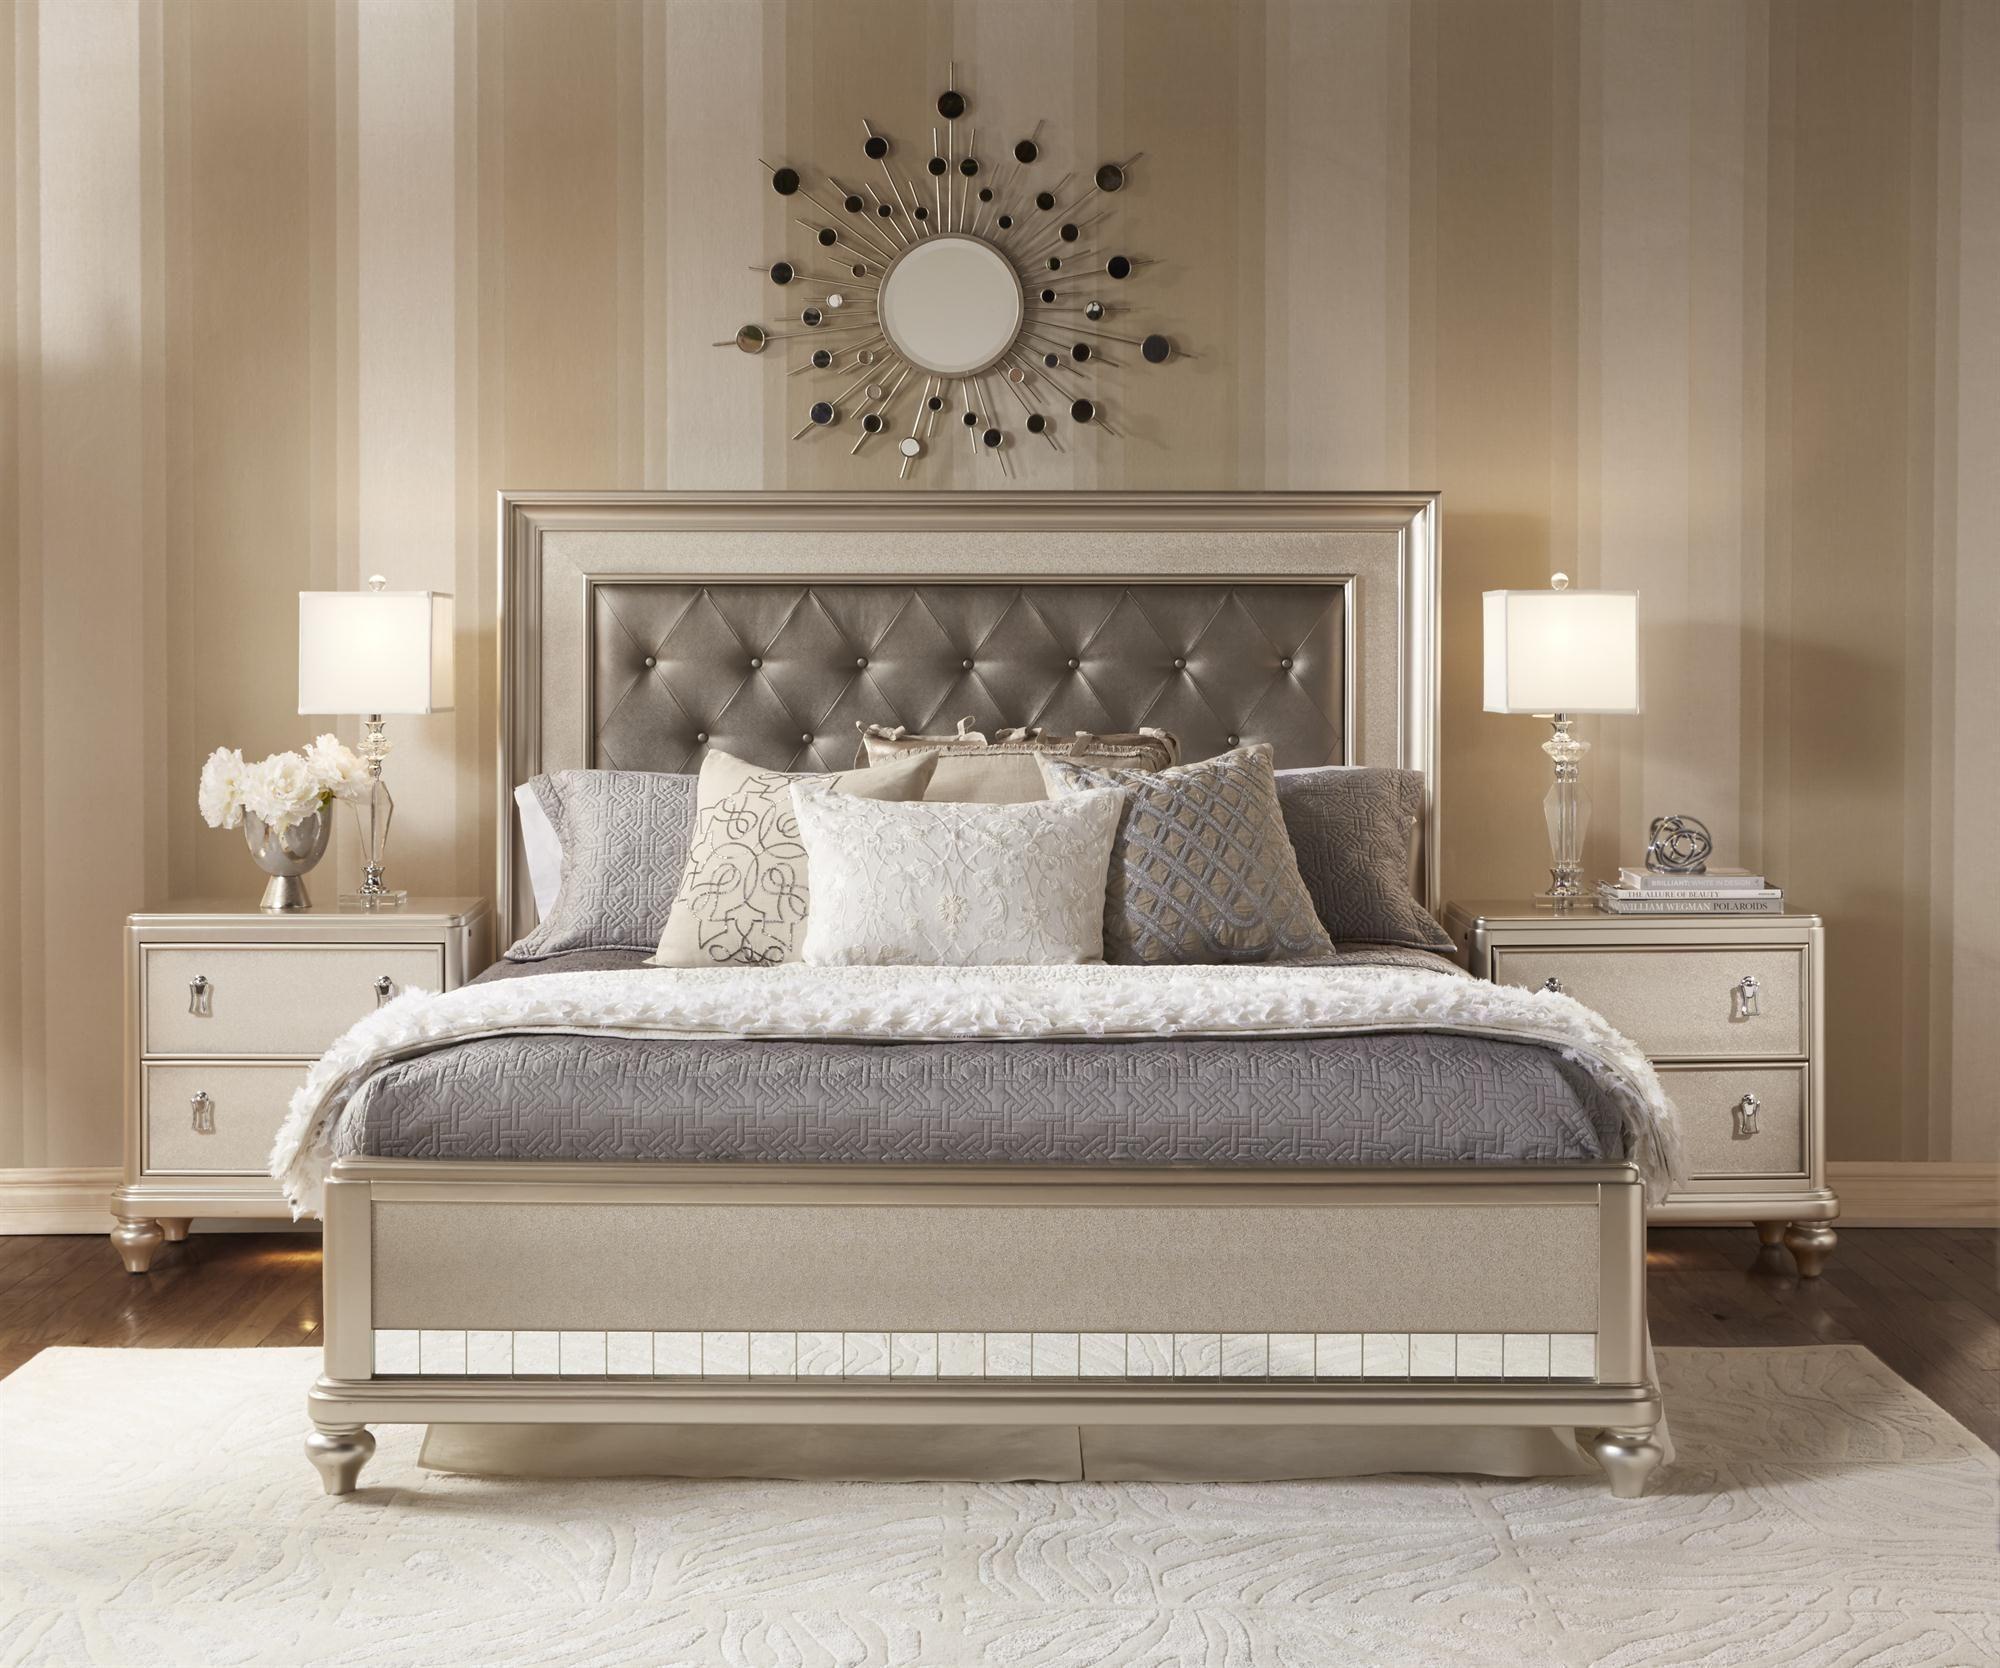 Diva Cal King Bedroom Group by Samuel Lawrence | Armando mi casa ...